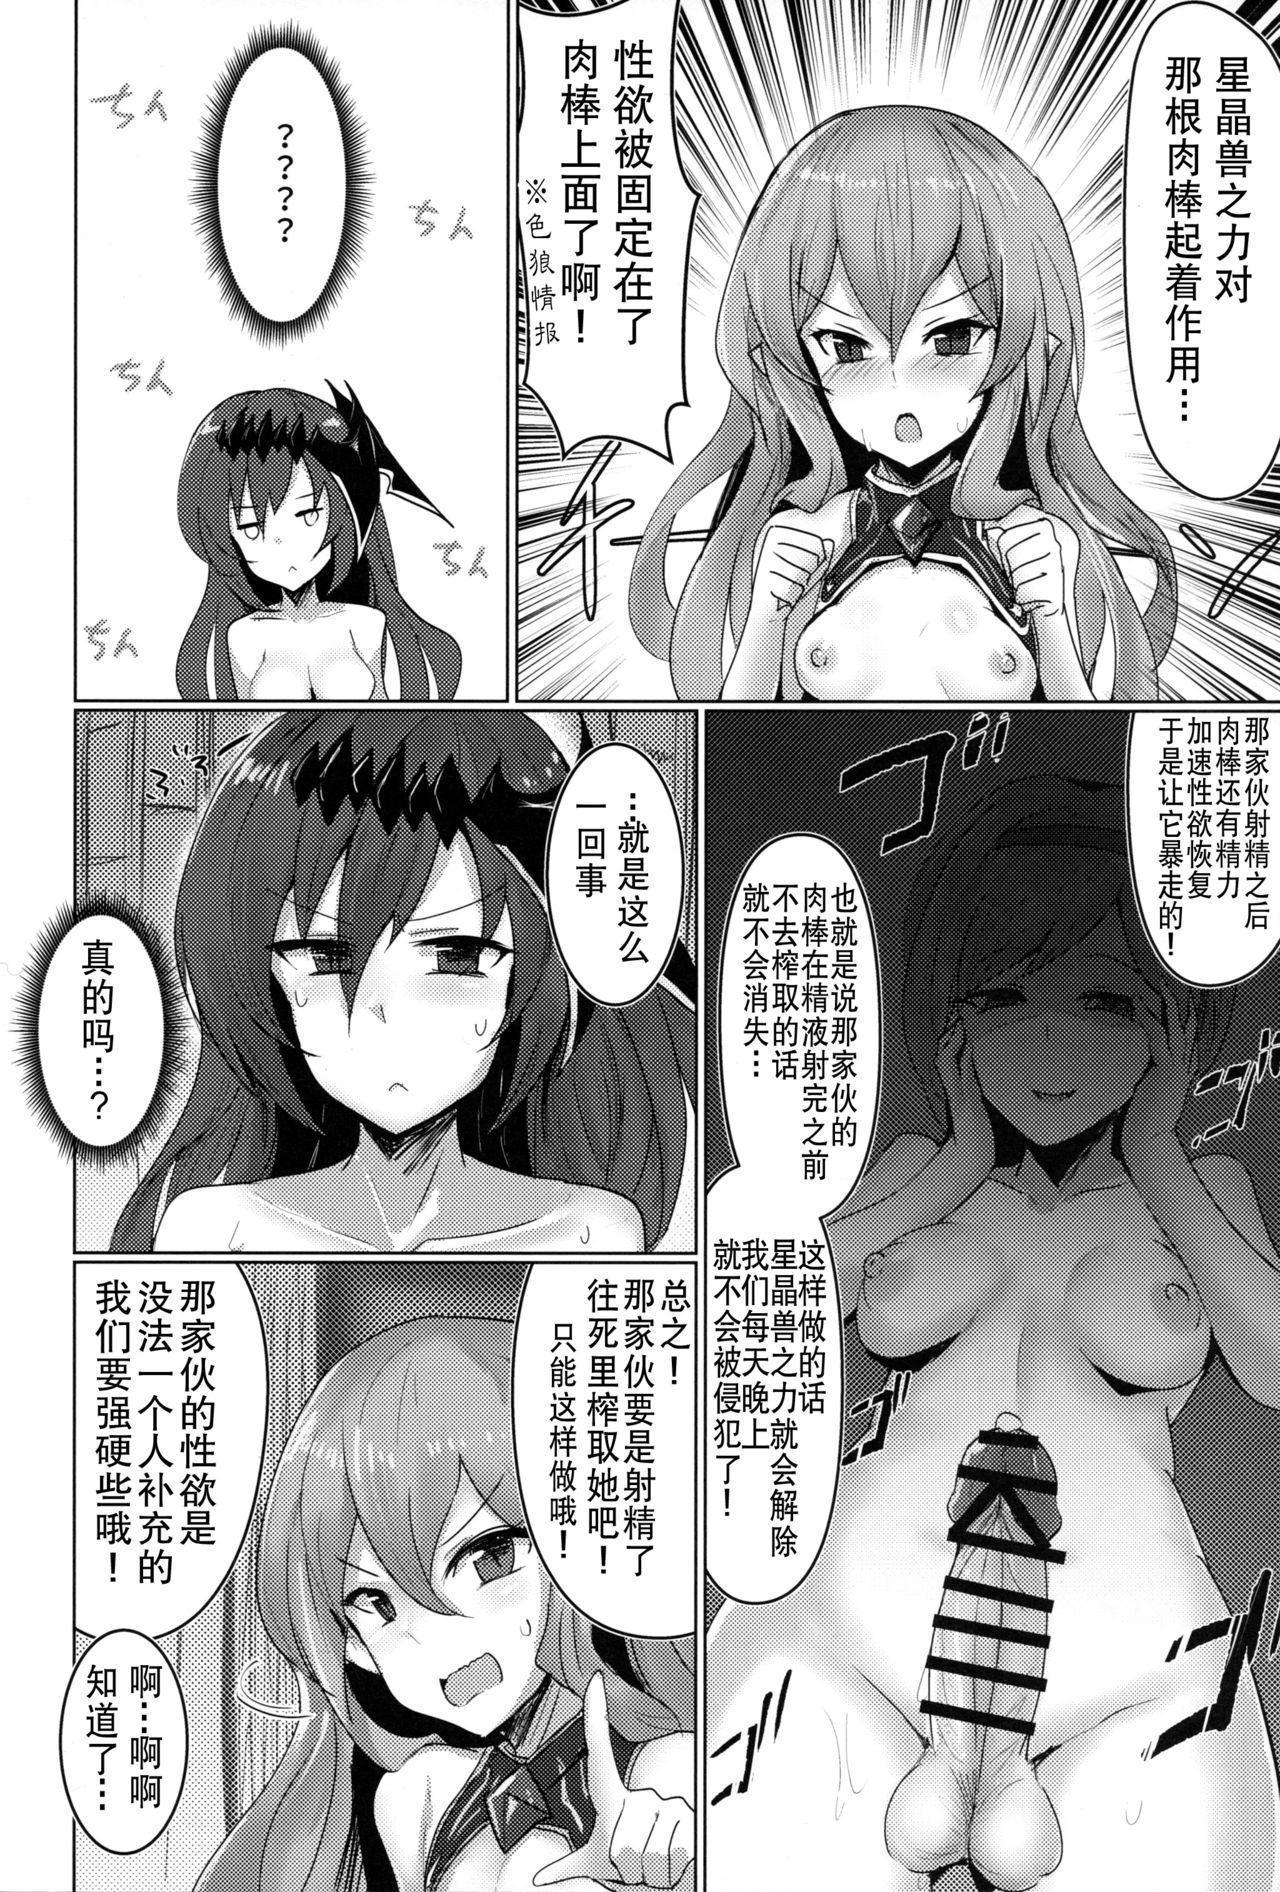 Shiniki Shinpan MANIAC   神域侵犯 MANIAC 5